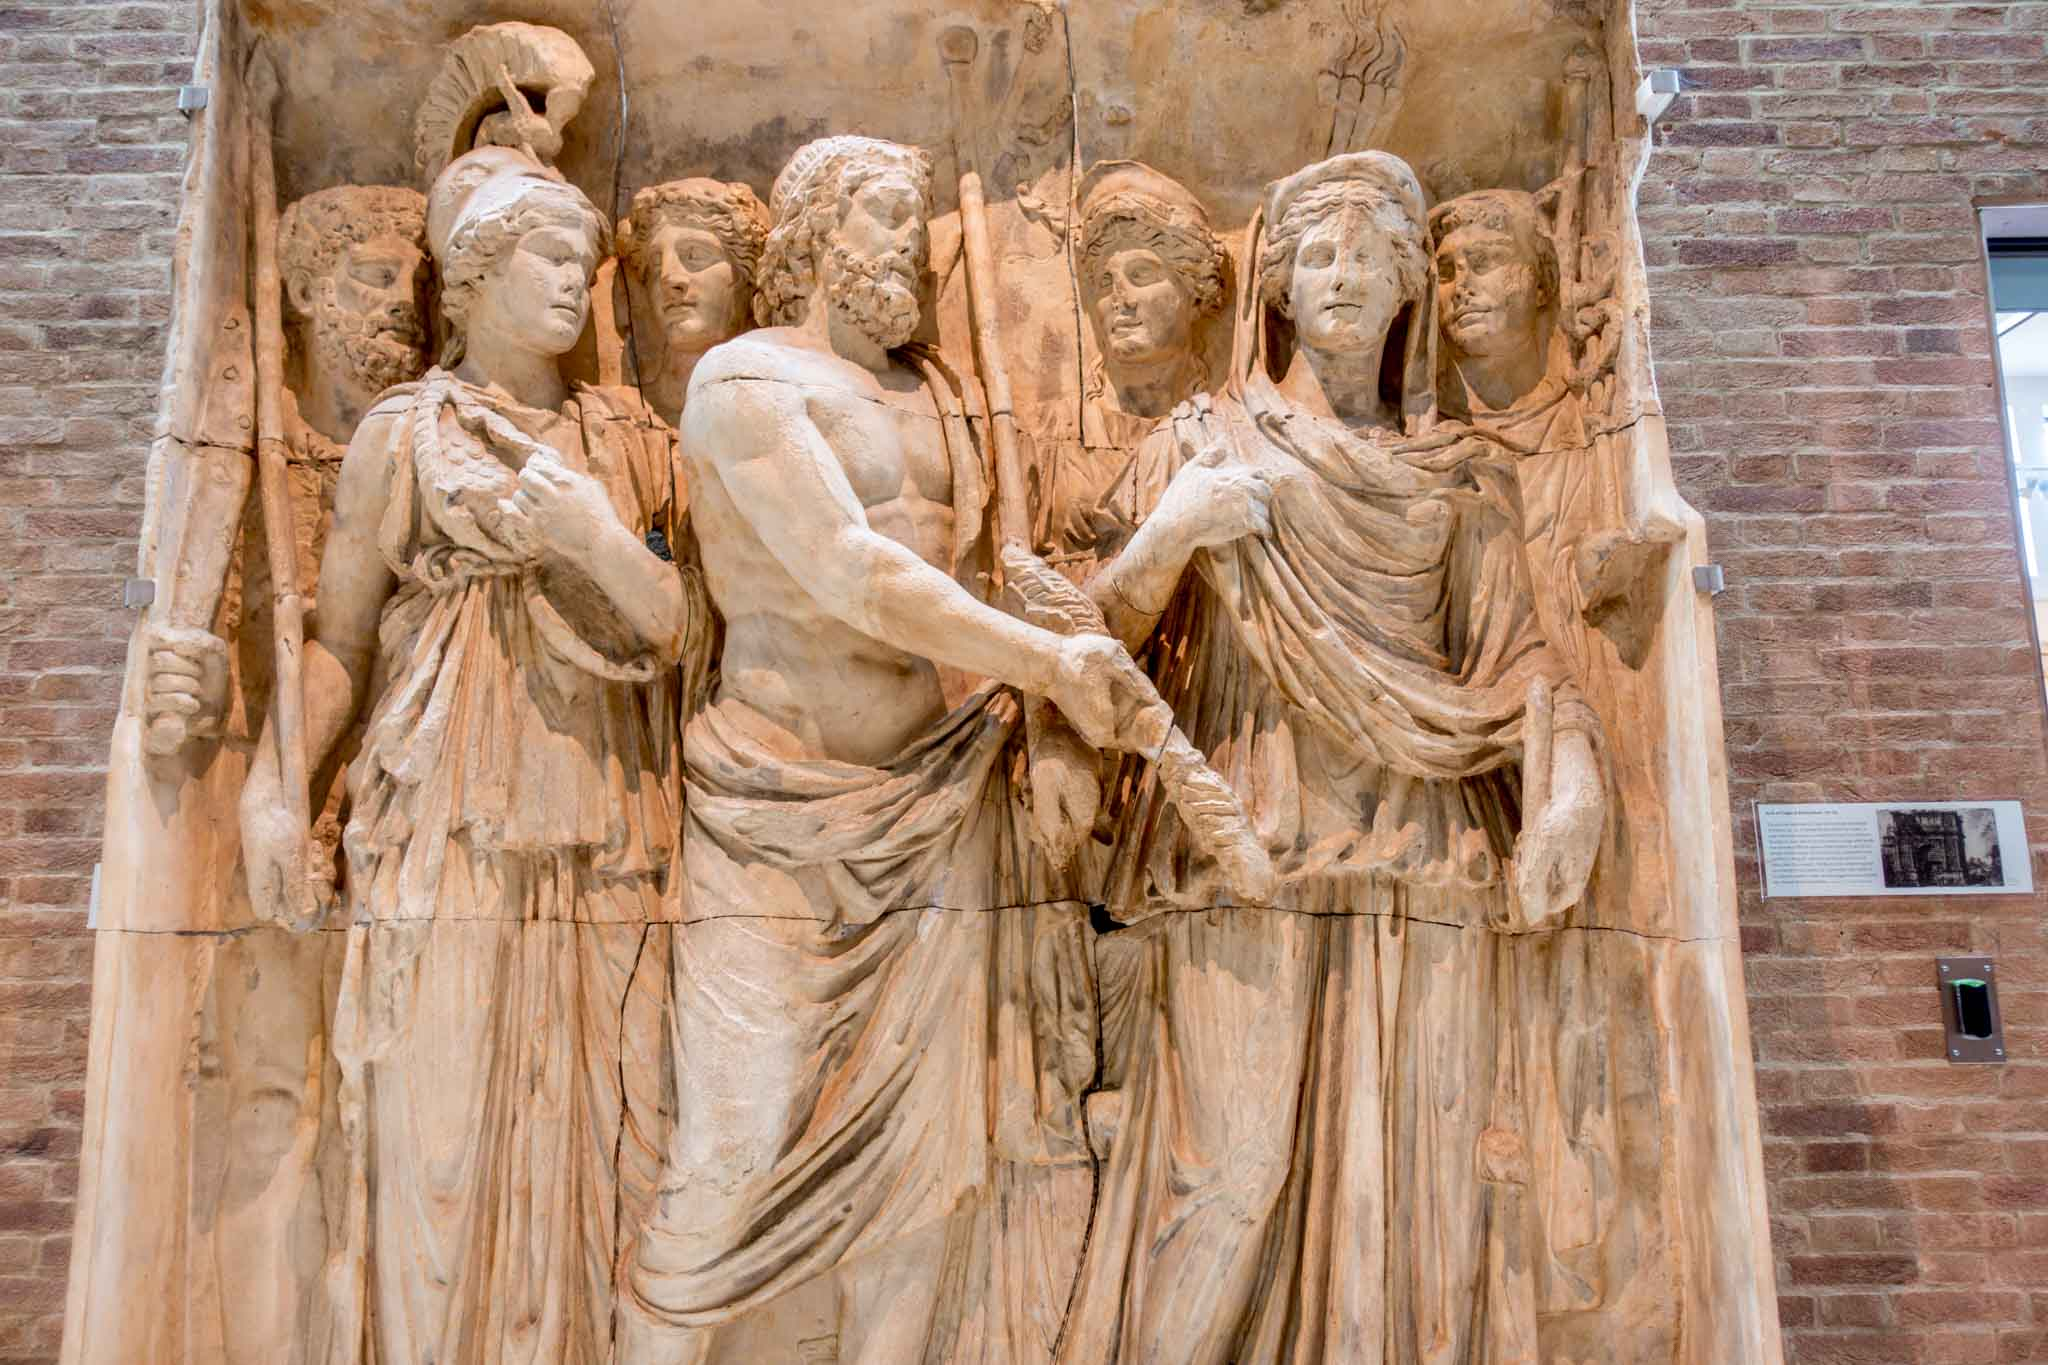 Greek and Roman statues in Ashmolean Museum